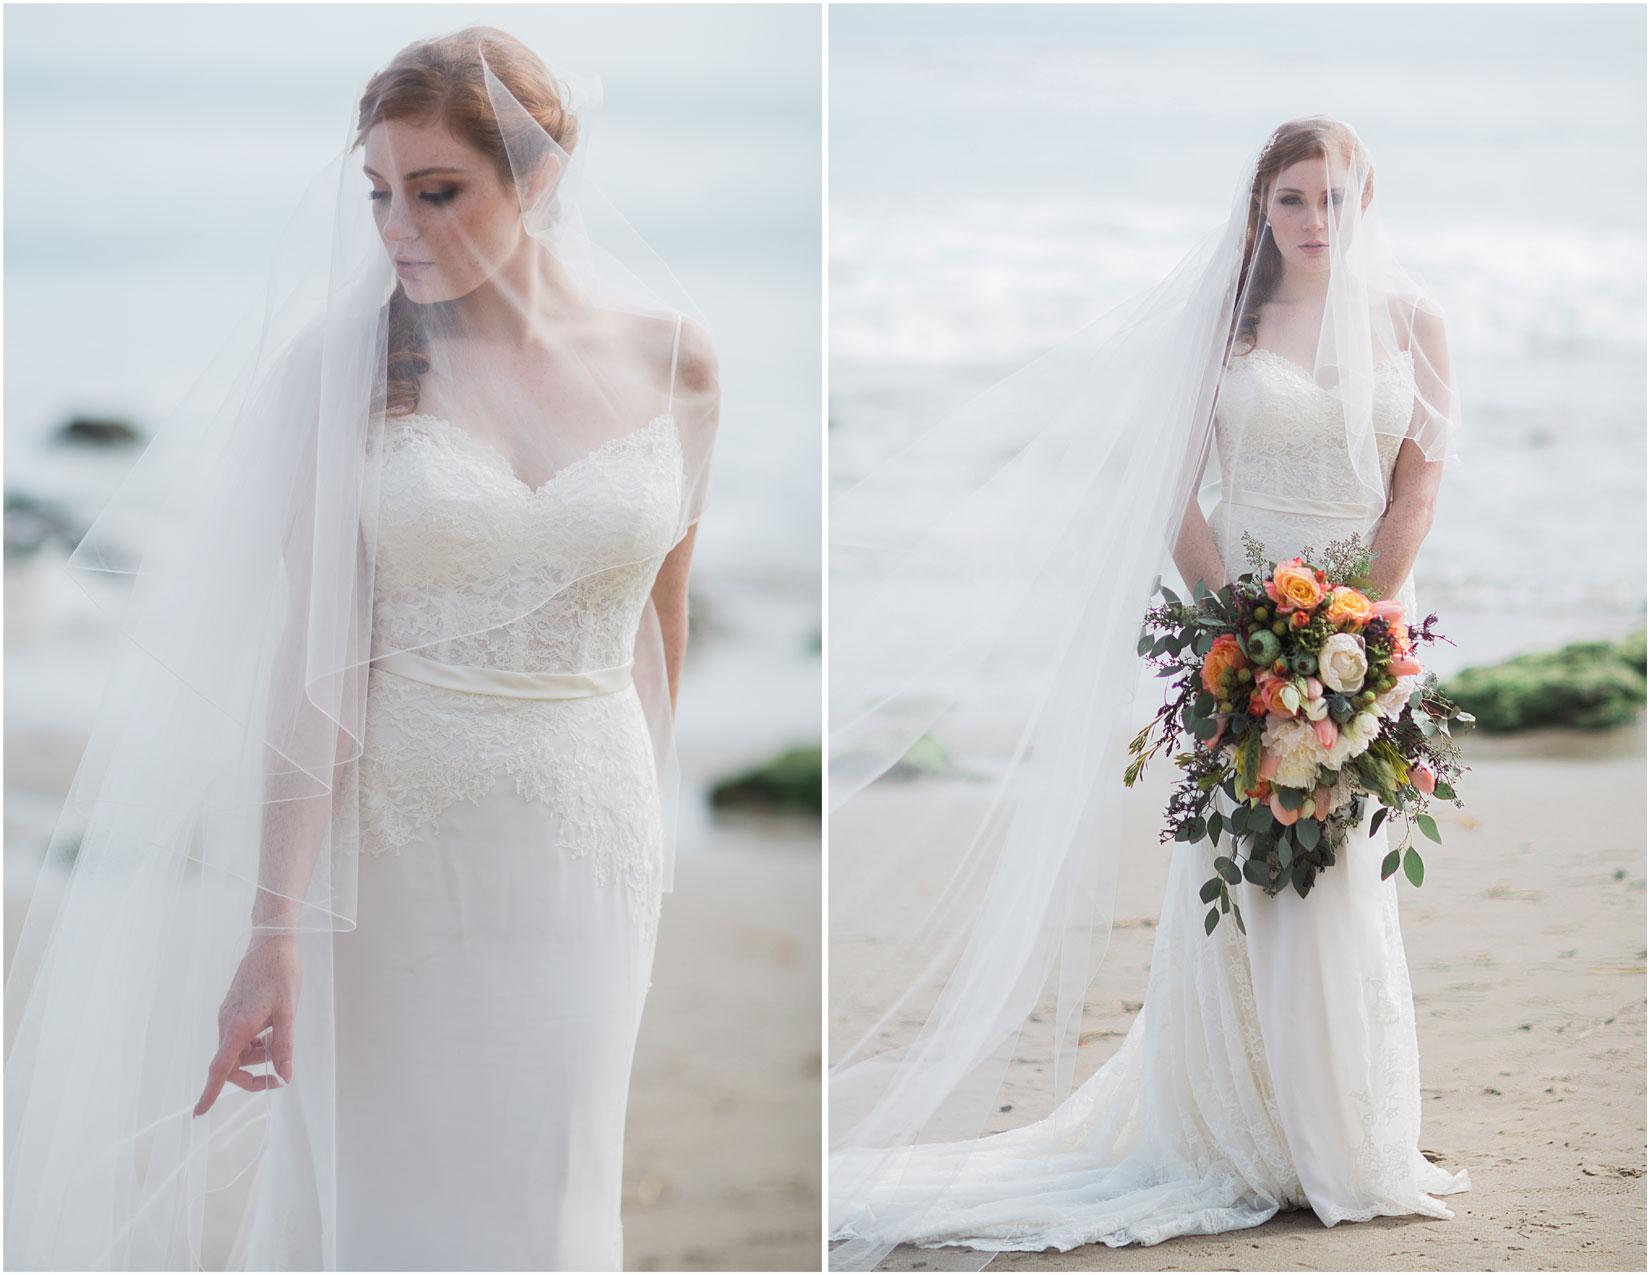 Bel-Aire-Bridal-Jen-Fuj-Photography-V7164C